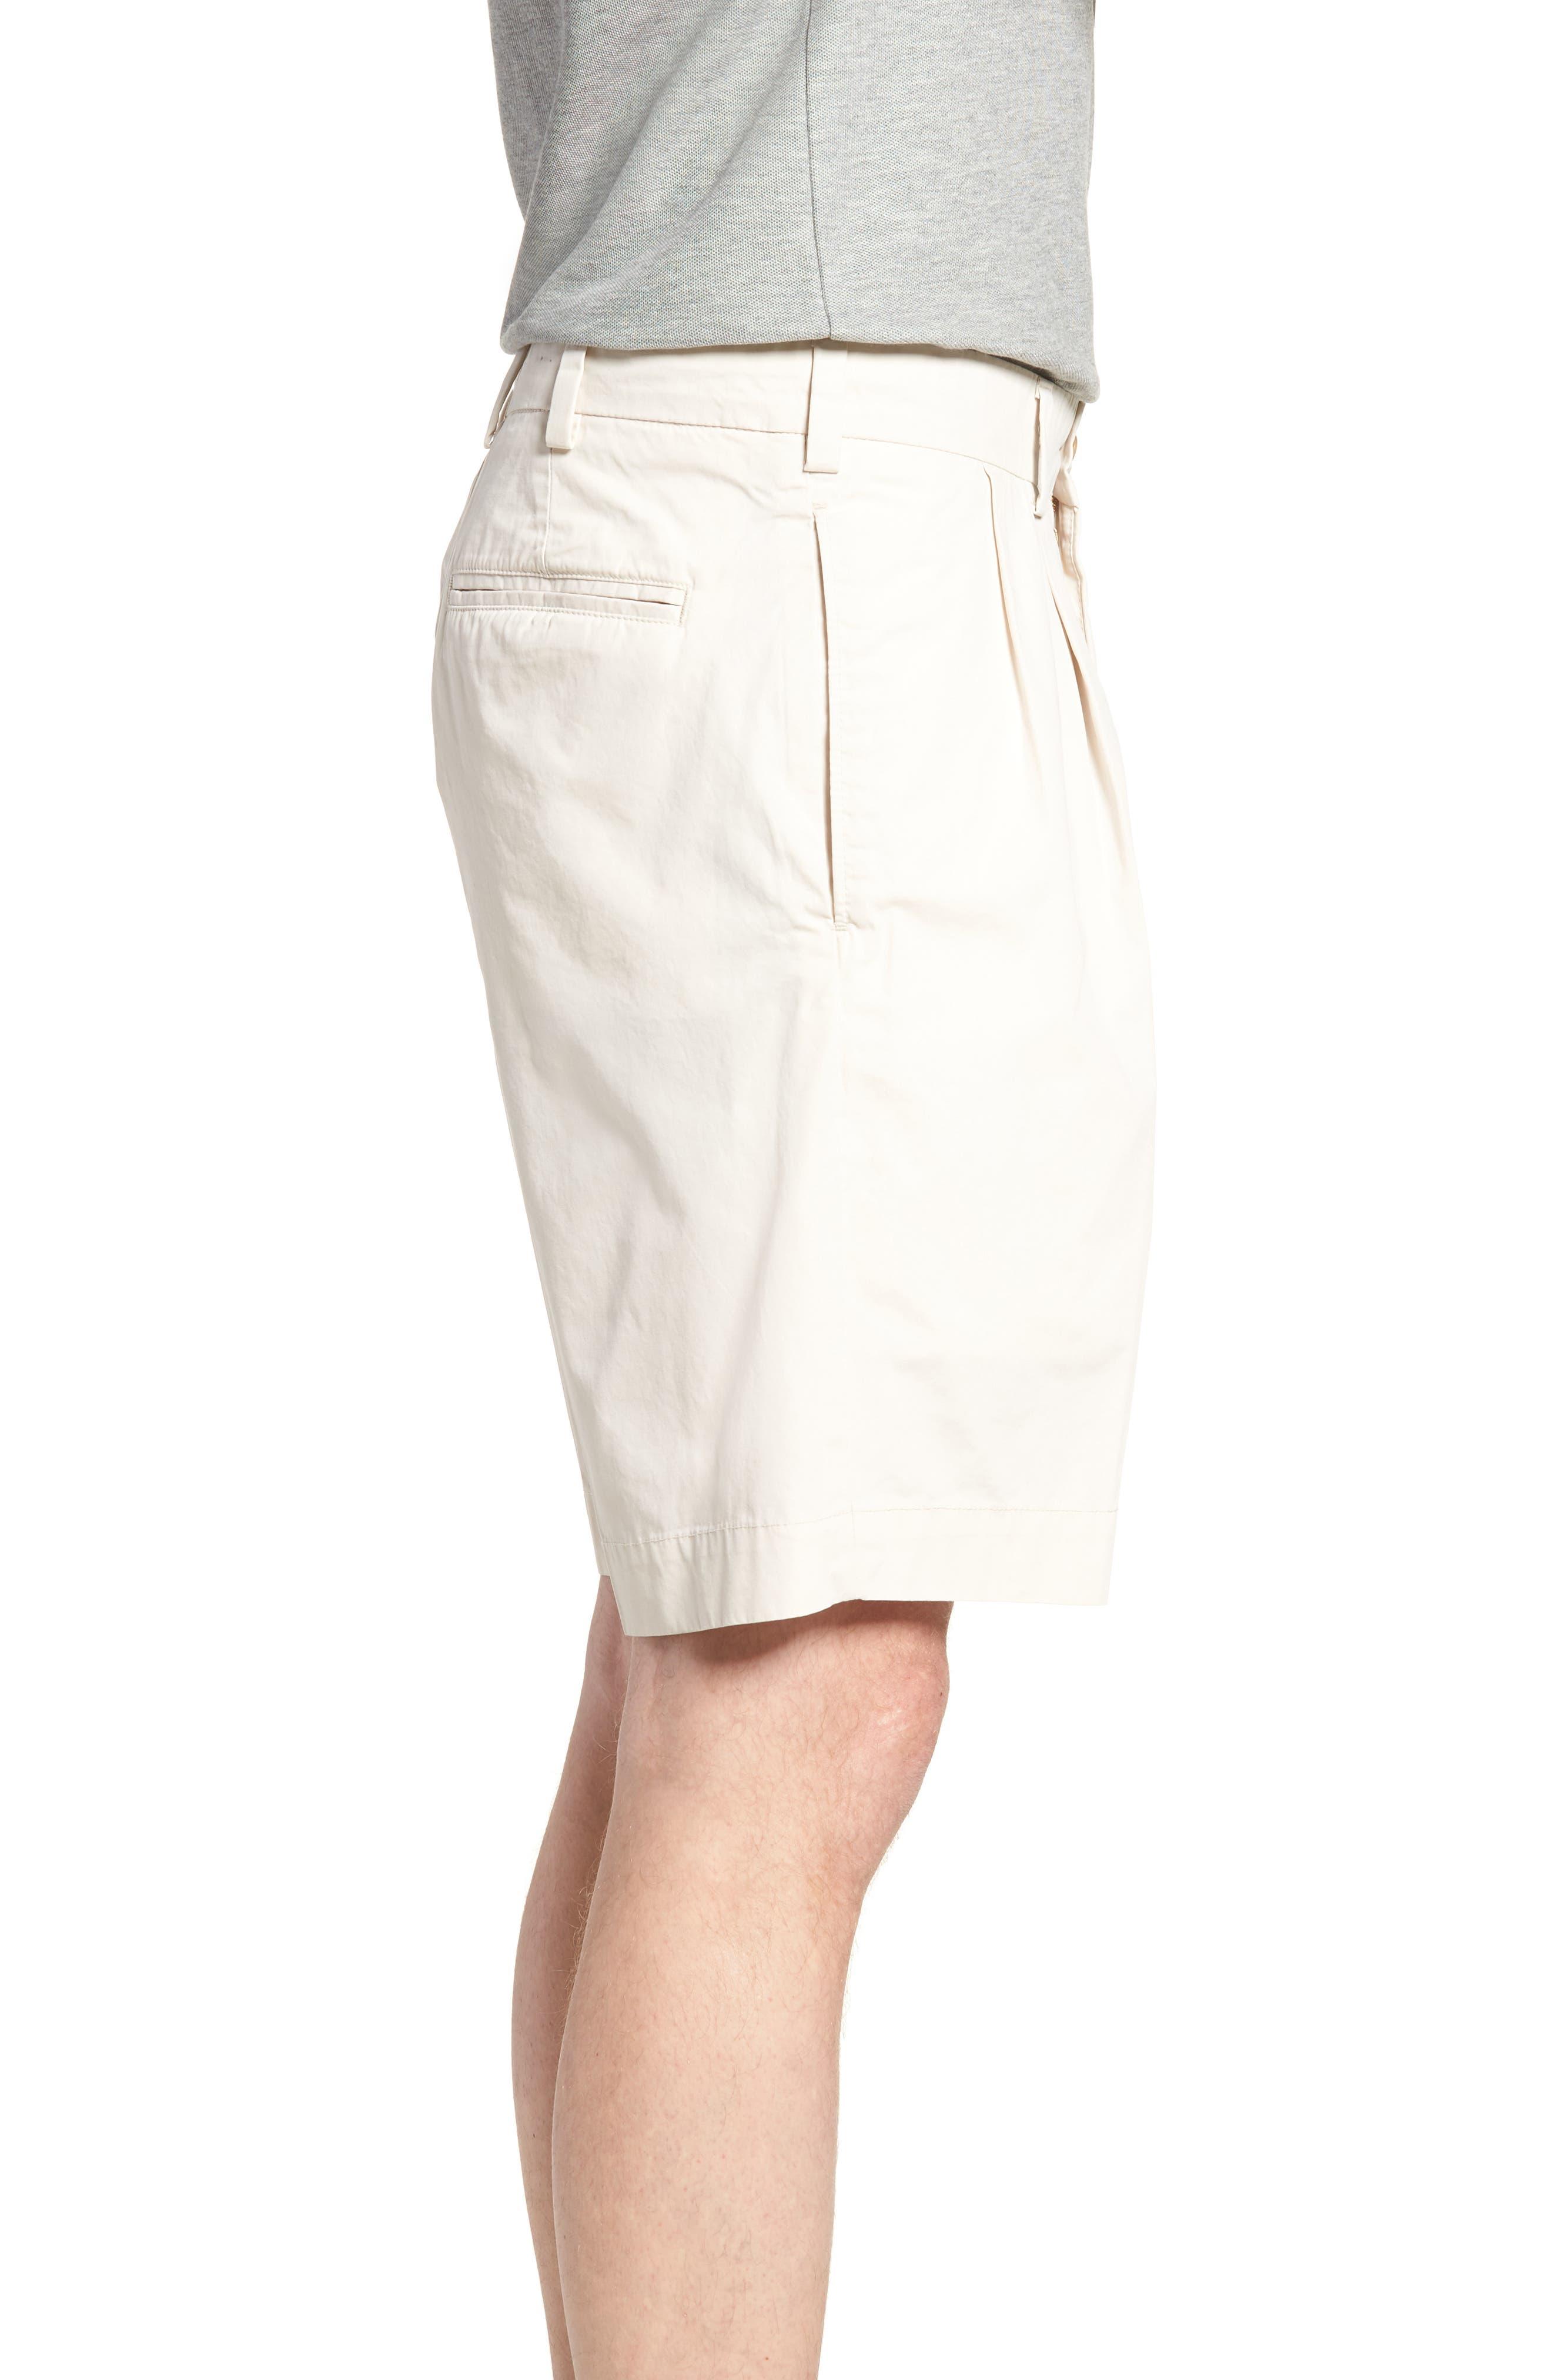 M2 Classic Fit Pleated Tropical Cotton Poplin Shorts,                             Alternate thumbnail 3, color,                             280